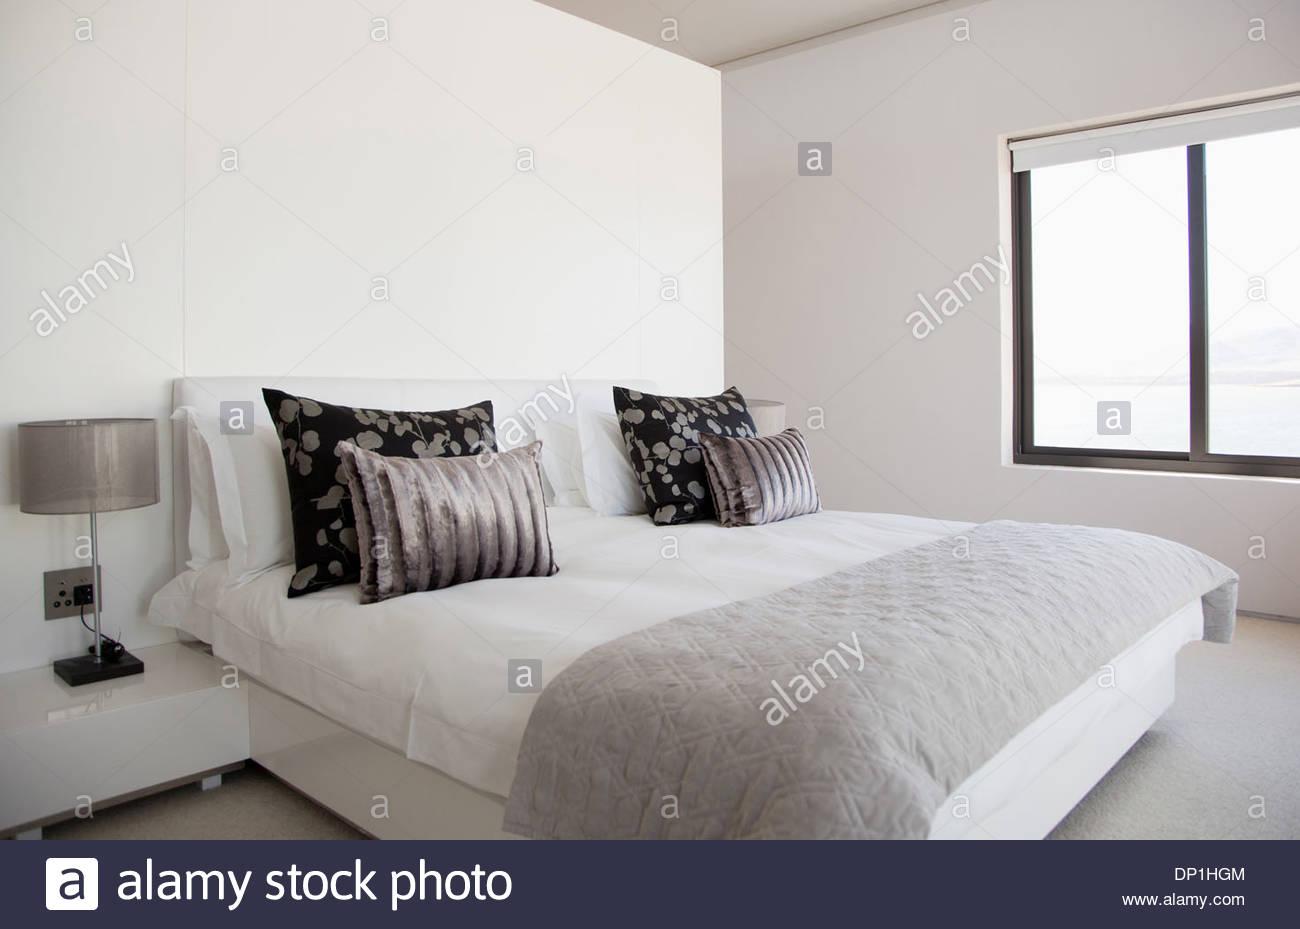 Bed in modern bedroom - Stock Image